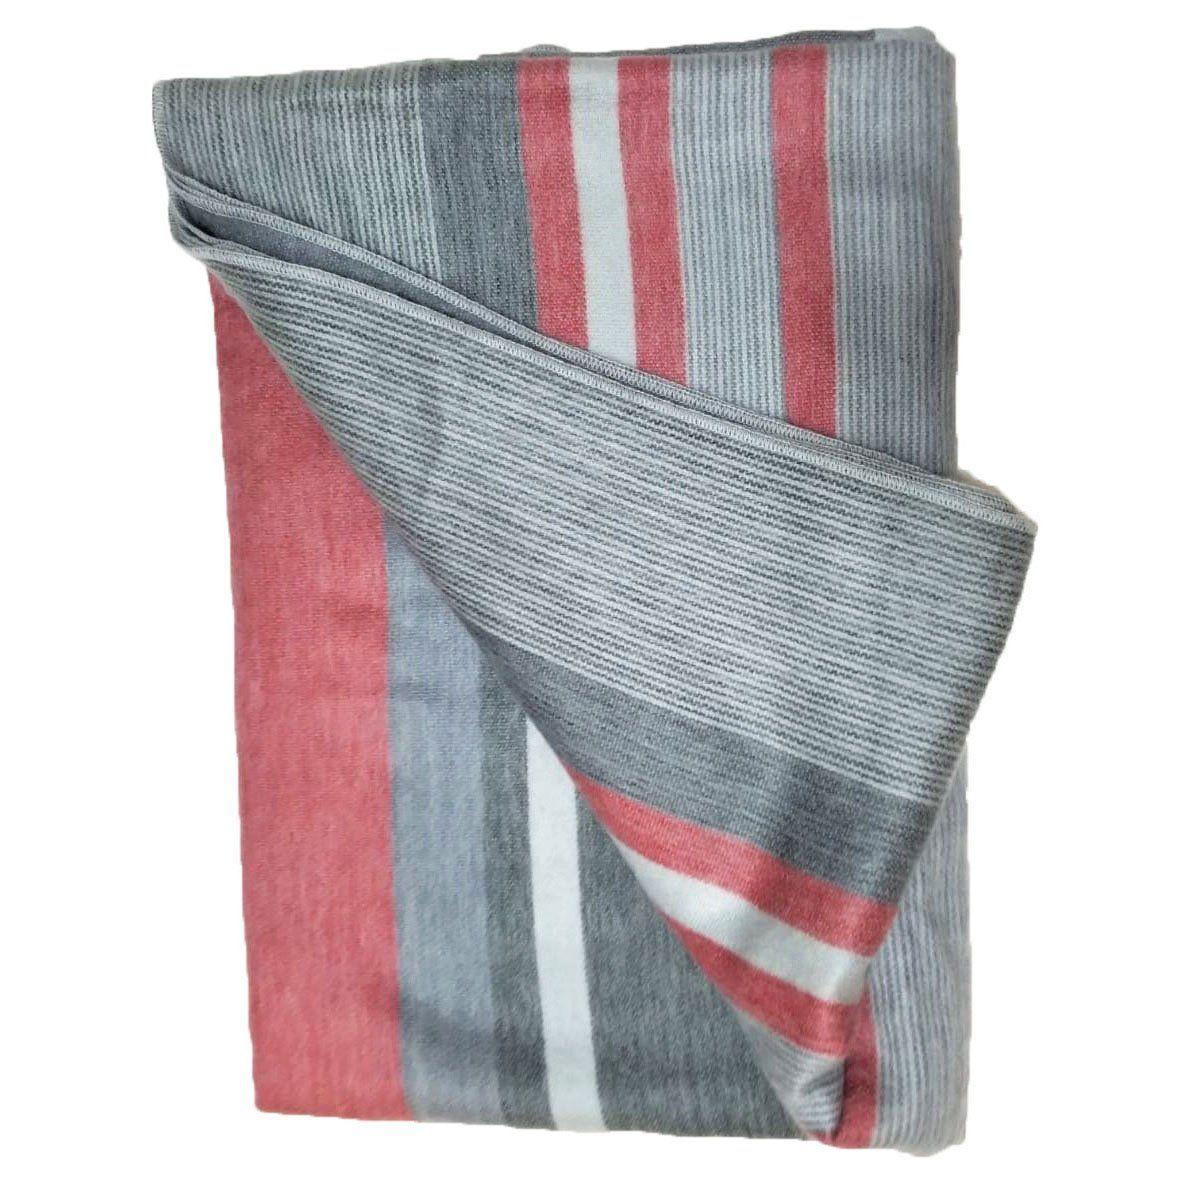 Elegant Pink Grey Striped Alpaca Sofa Blanket Bedding First Home Gift